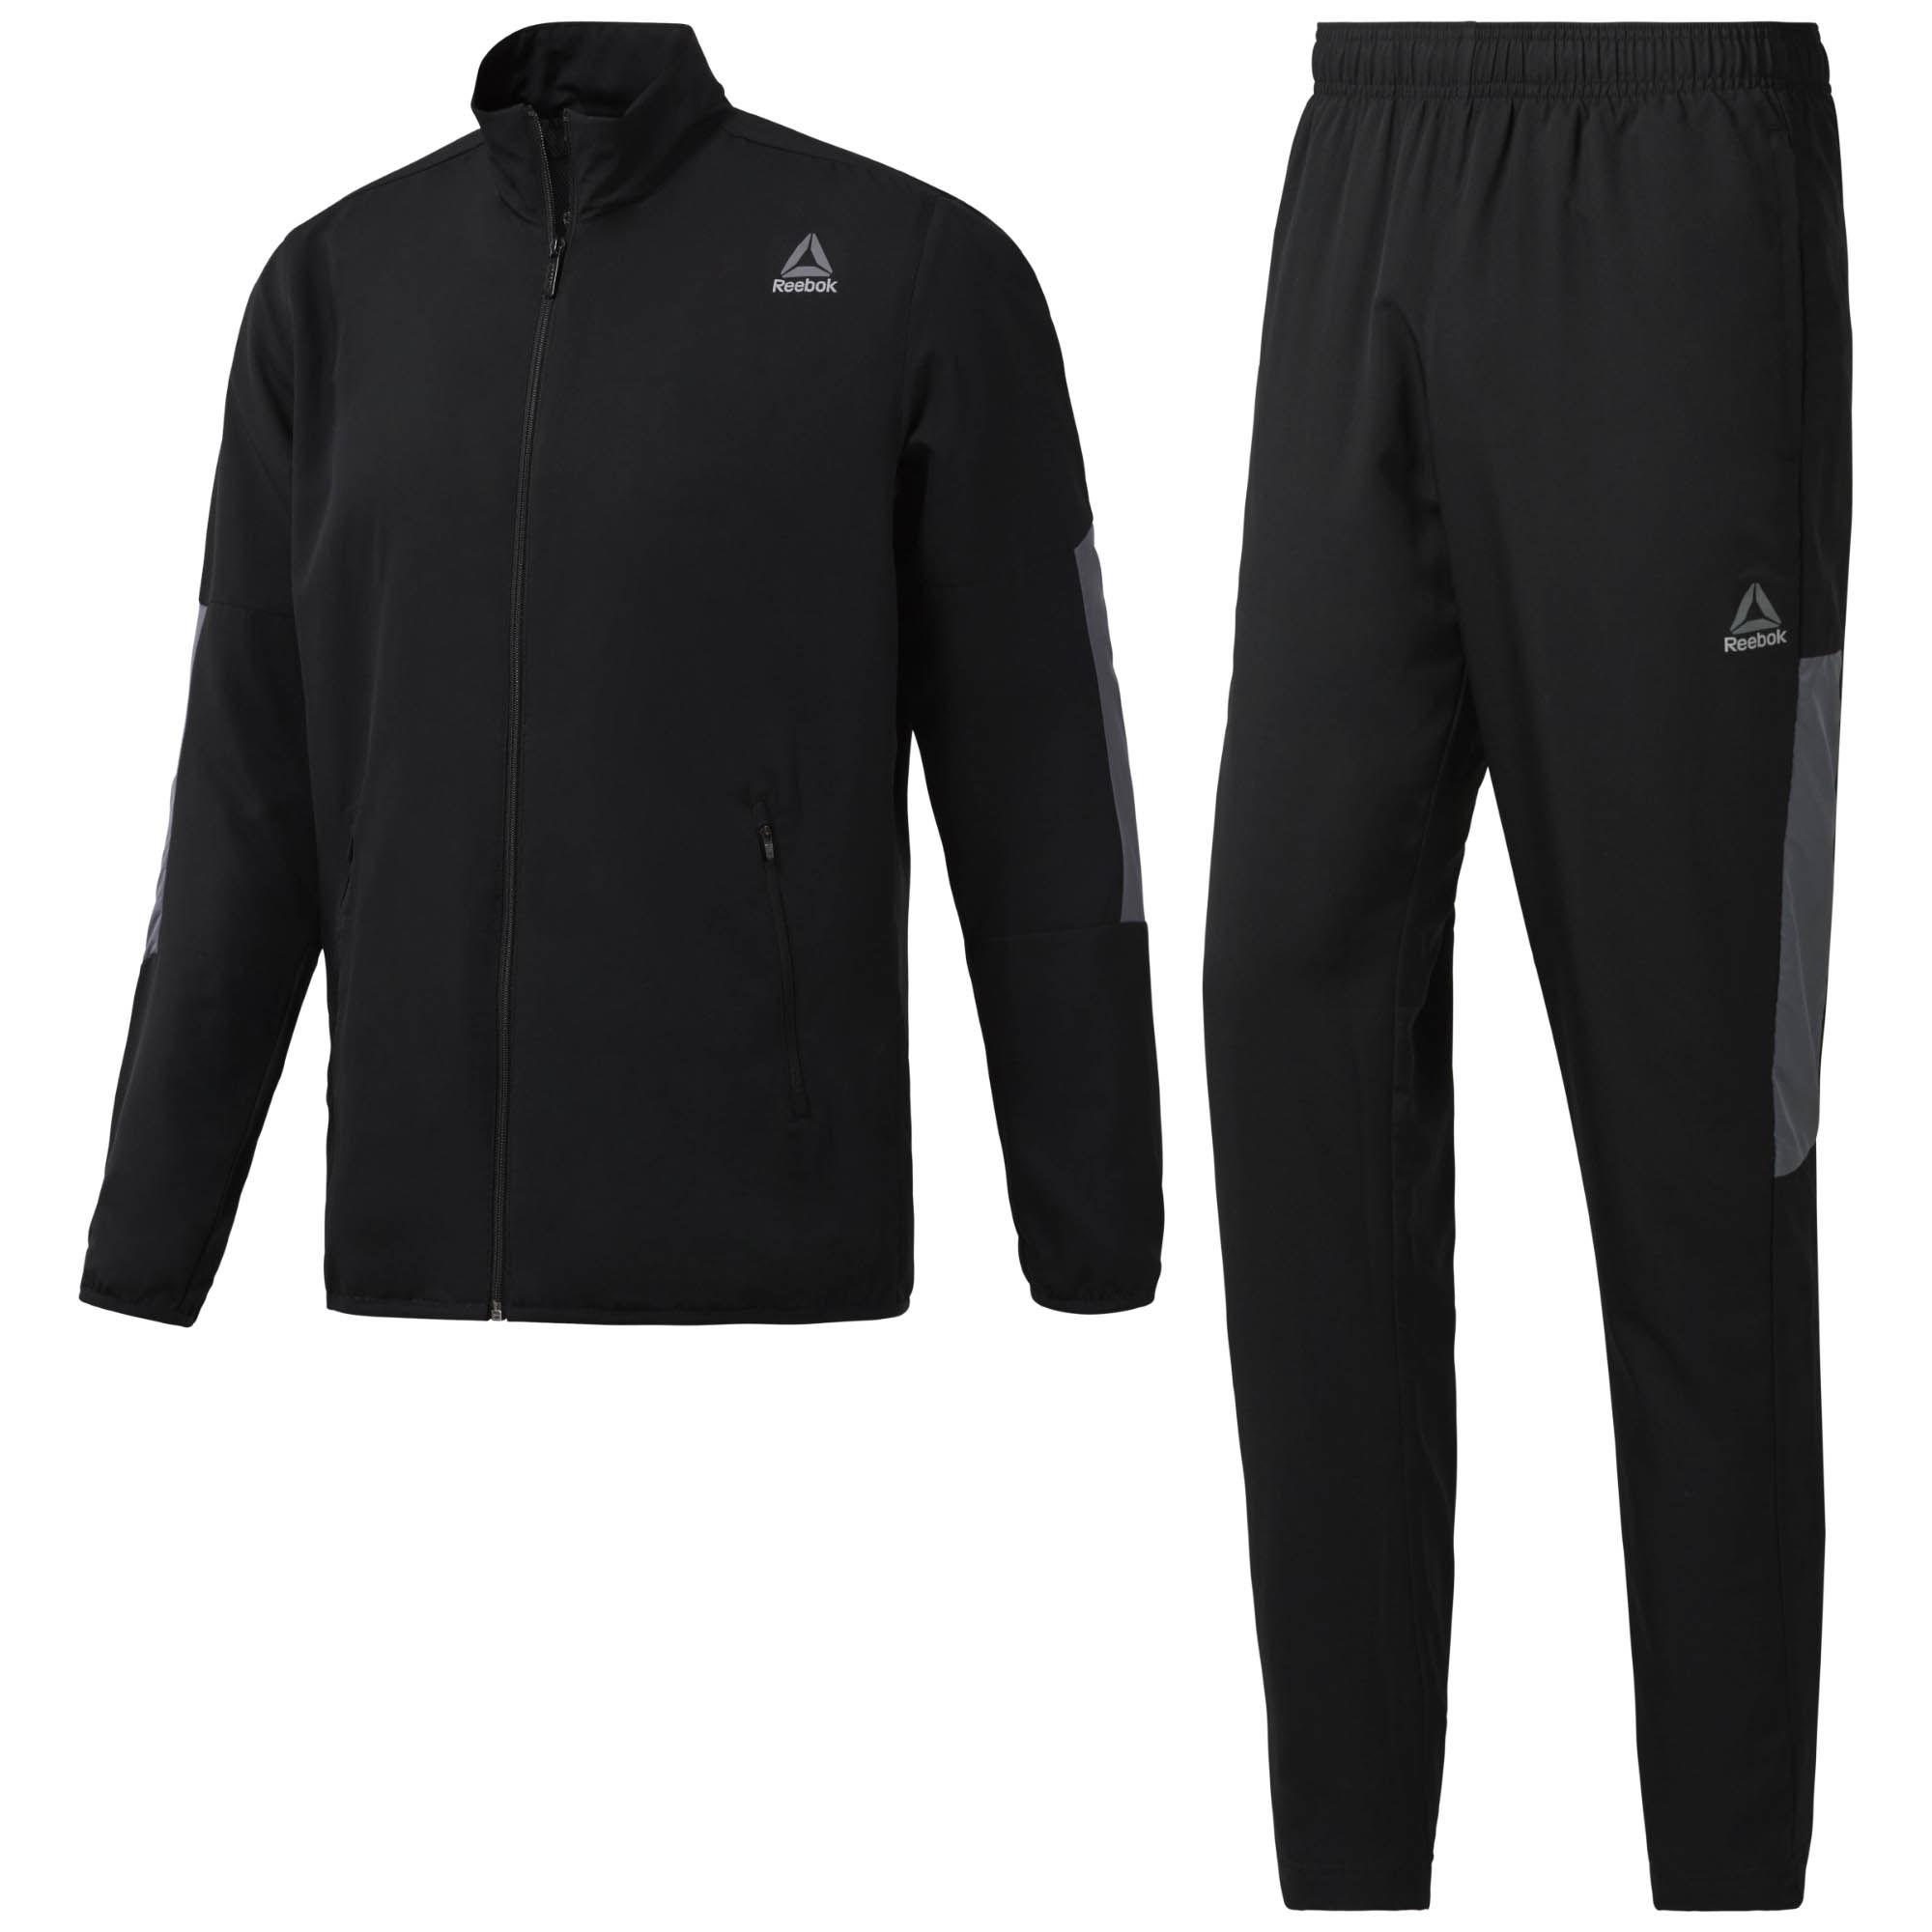 Спортивный костюм мужской Reebok Ts Techy Woven, цвет: черный. BQ5806. Размер L (52/54)BQ5806